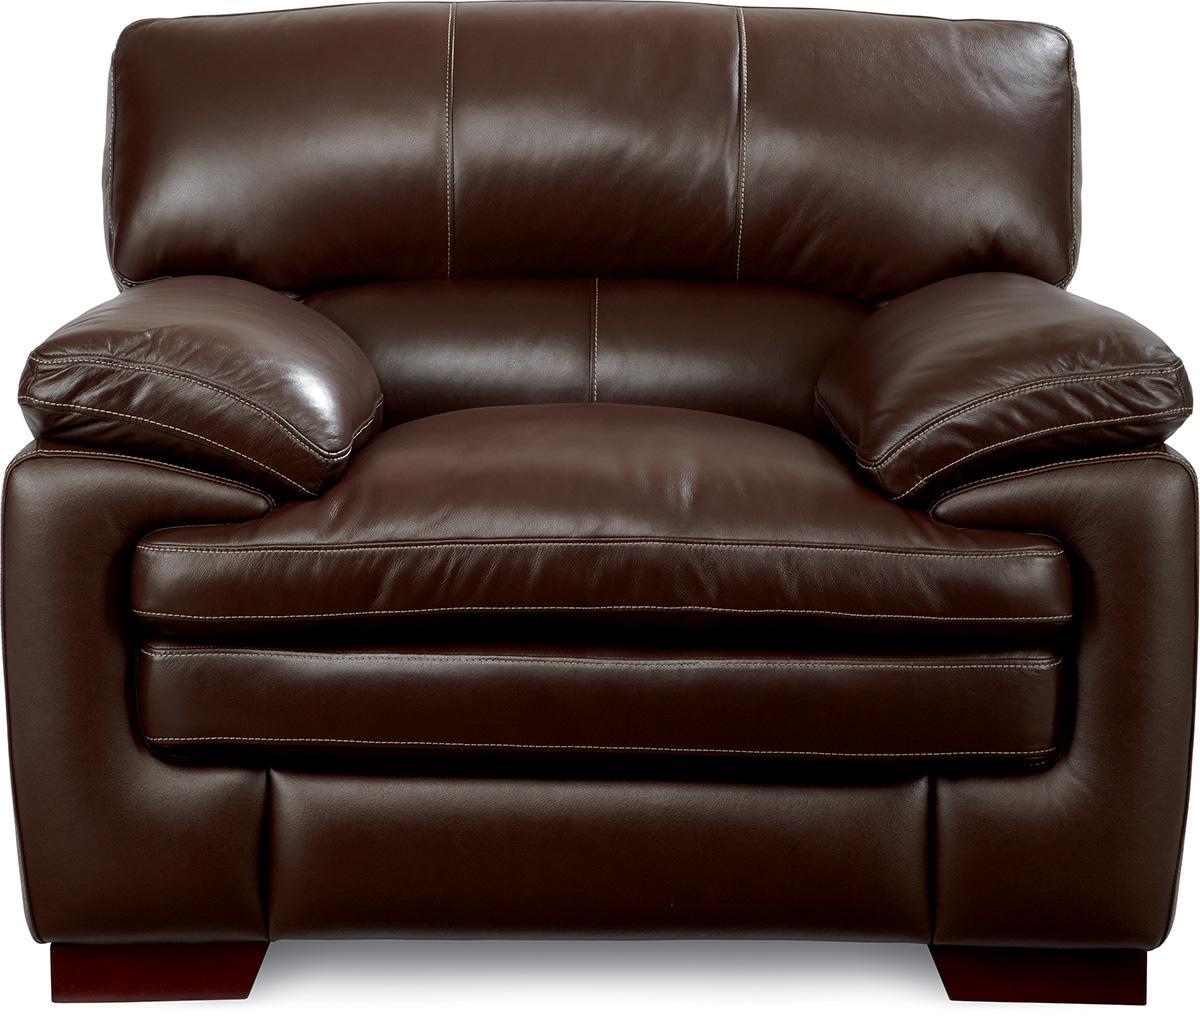 La-Z-Boy Dexter Casual Stationary Chair - Item Number: 700308LE991177